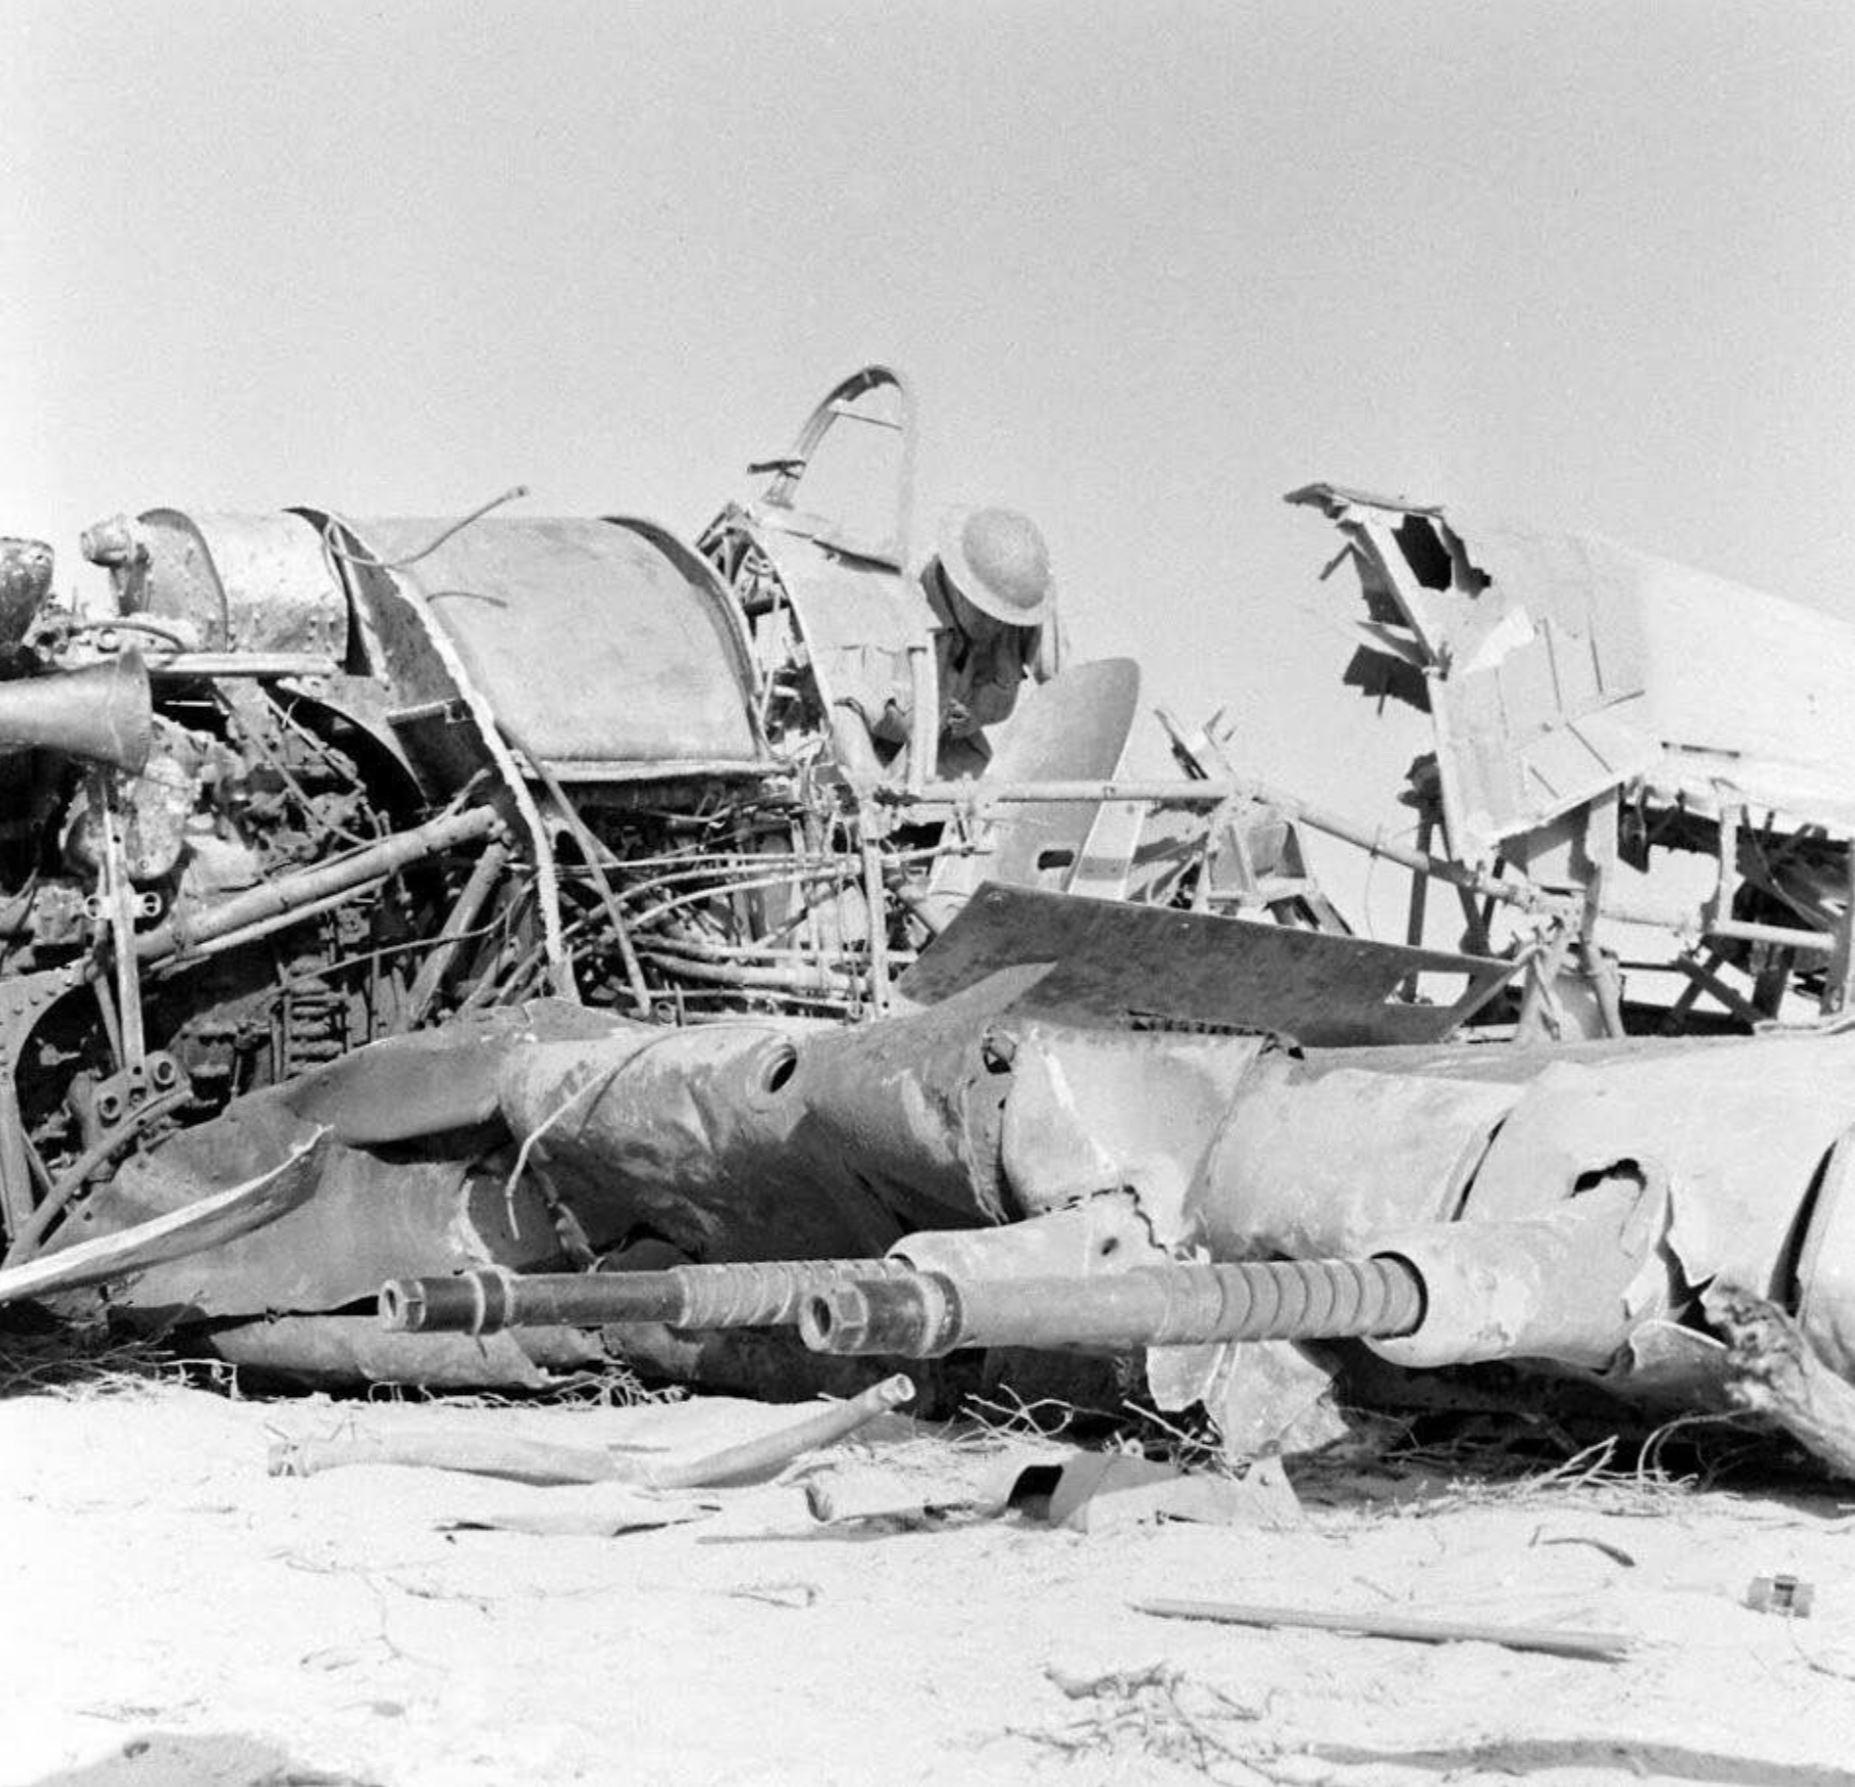 RAF Hurricane IIb shot down over the Egyptian desert 1942 ebay 01